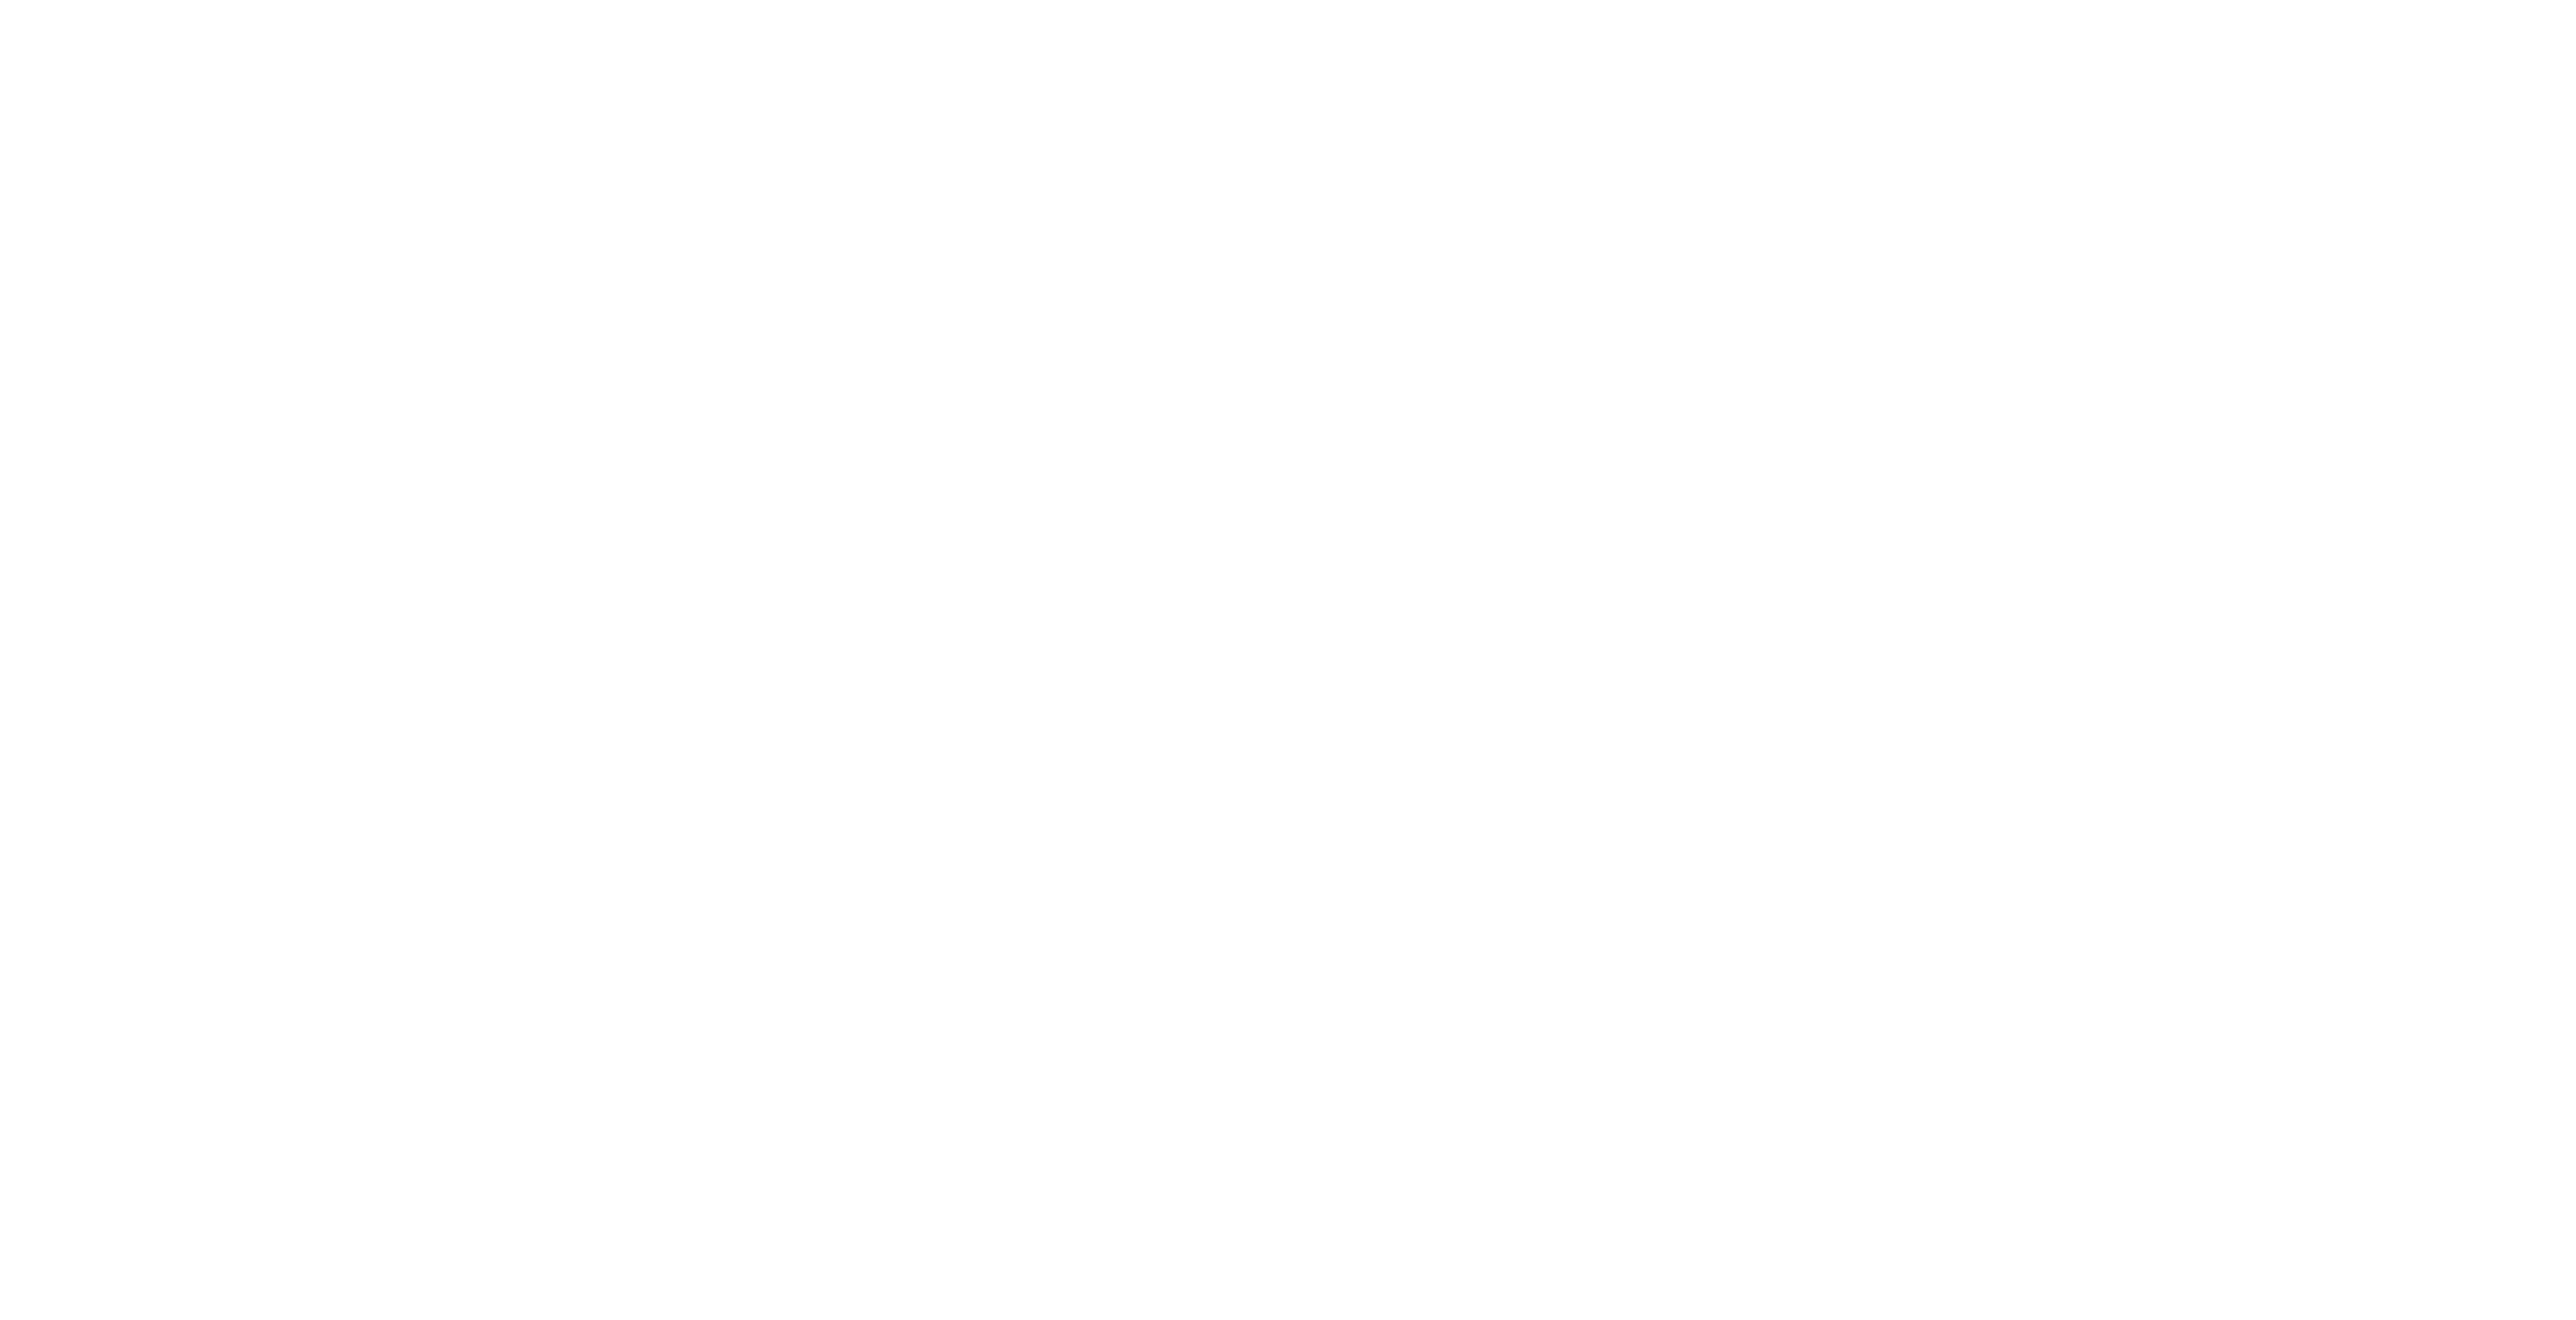 agencia de e-commerce